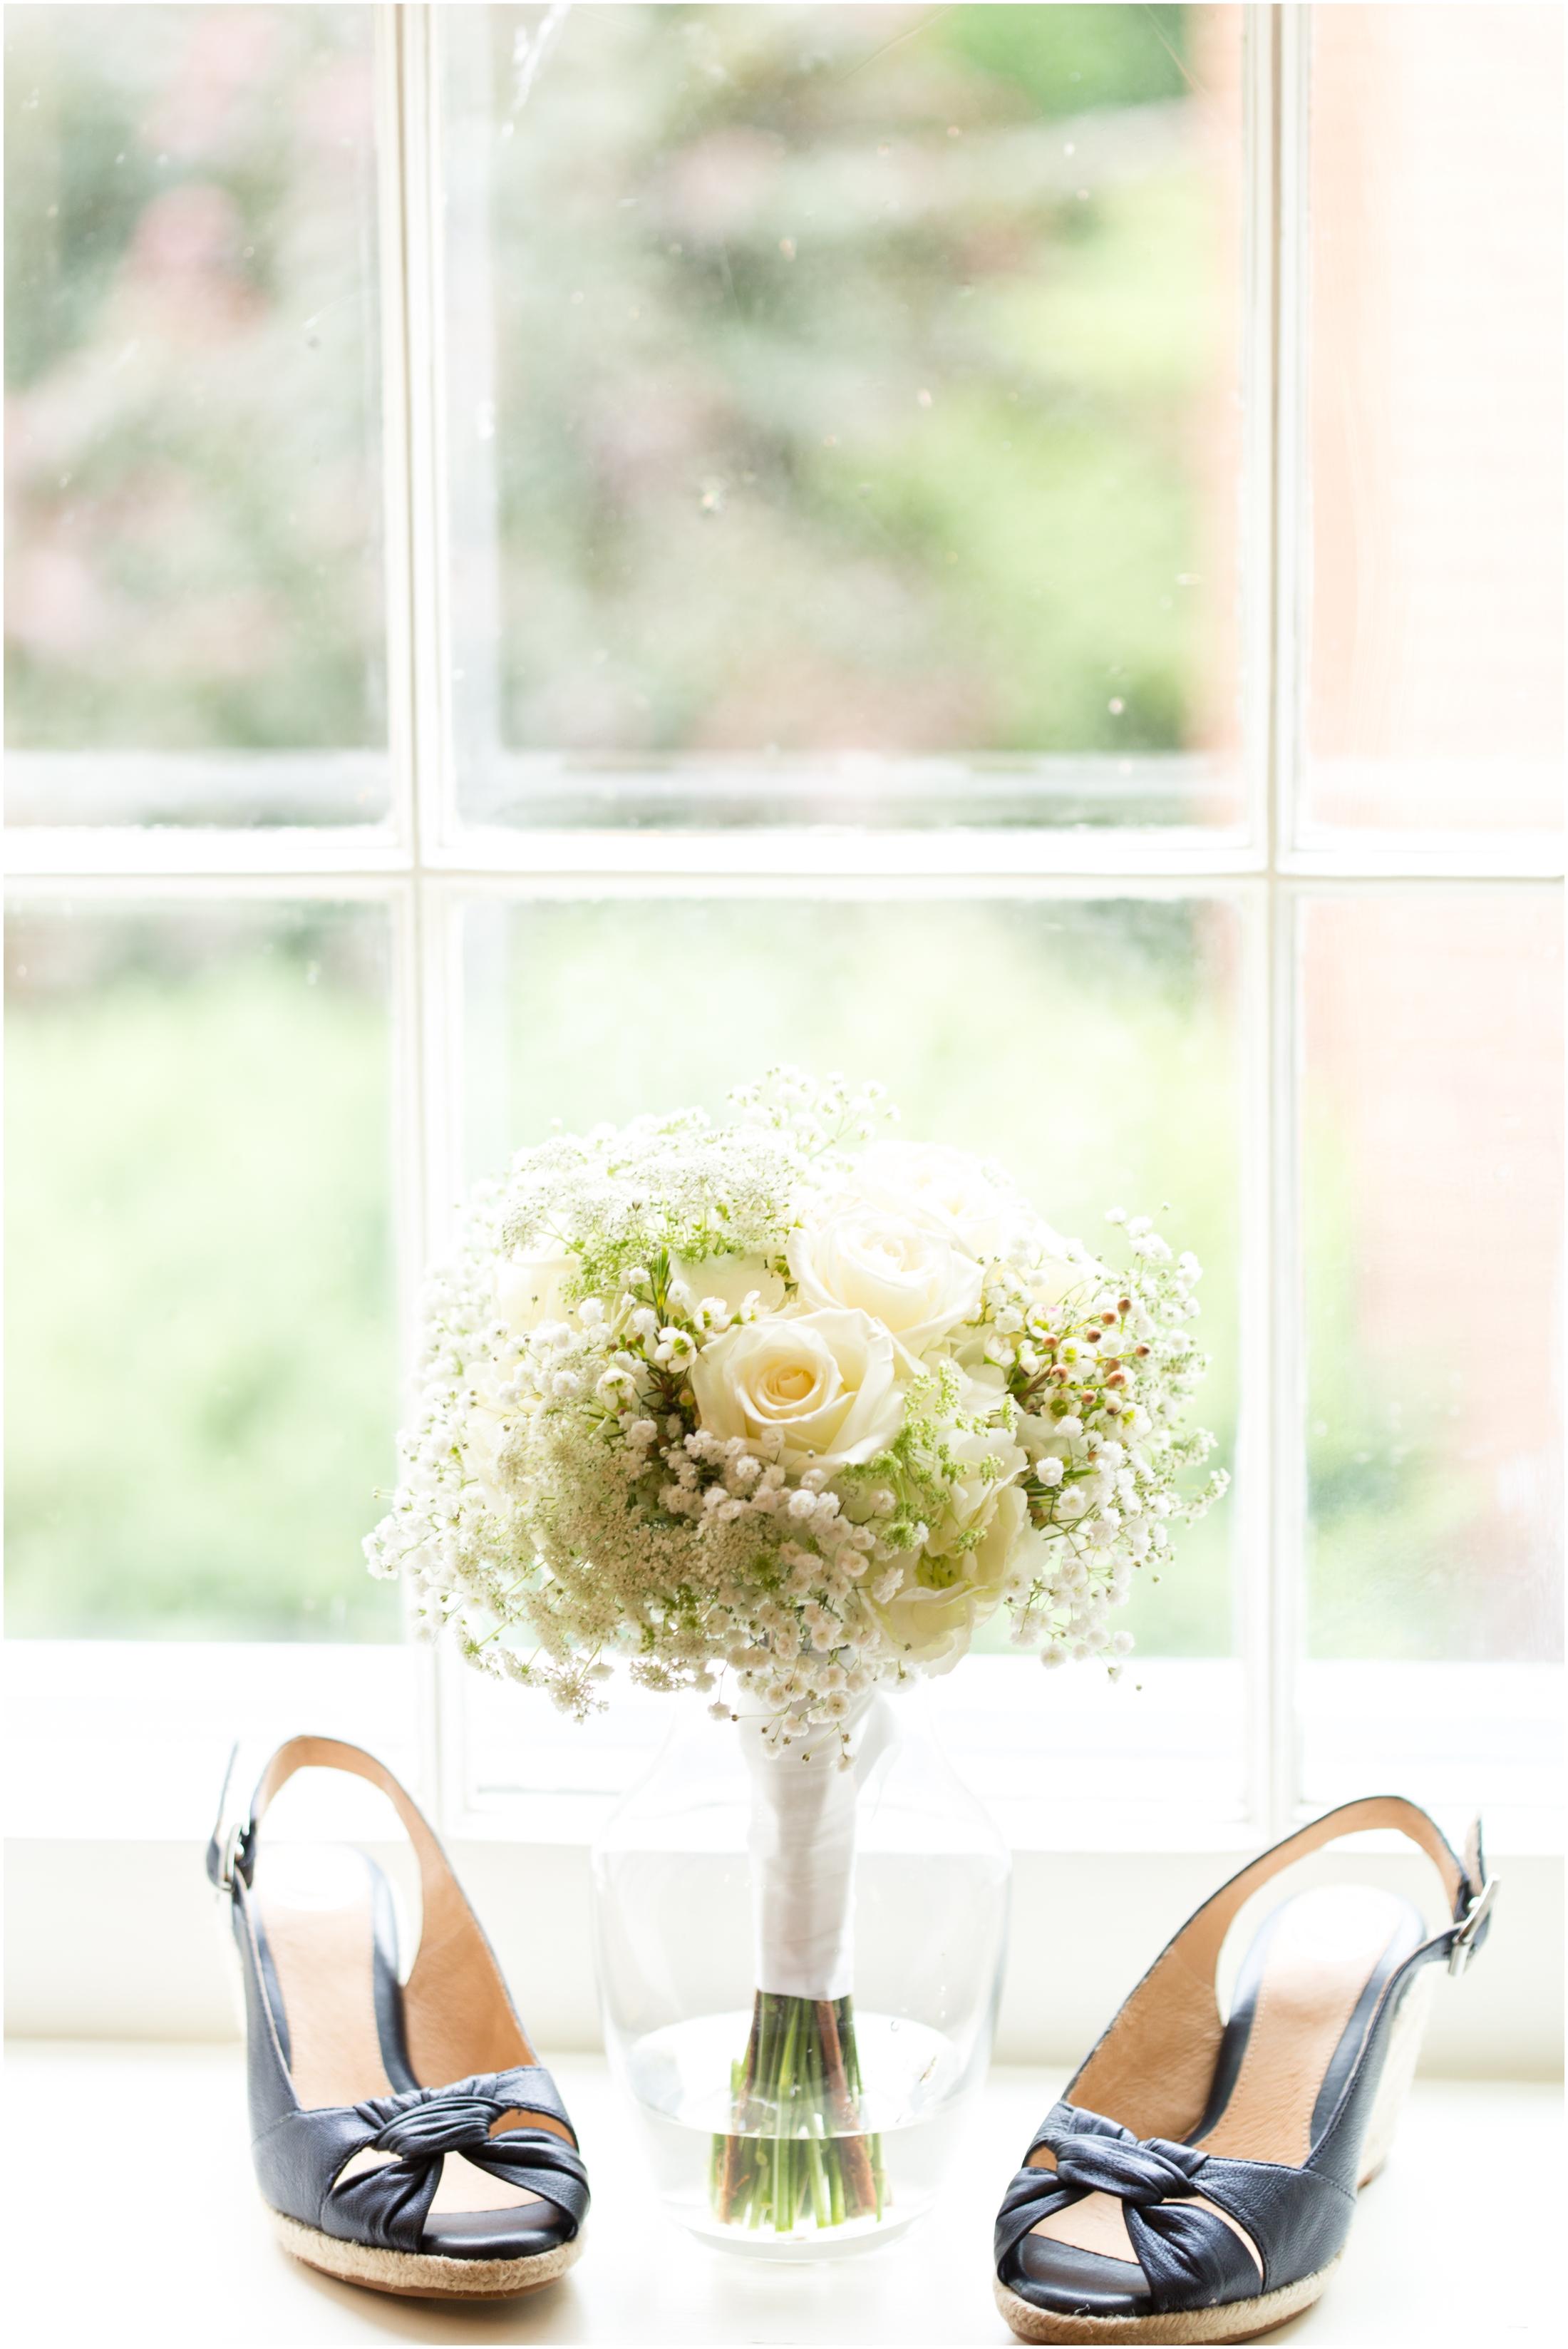 Nash-Wedding-Details-and-Getting Ready-42.jpg